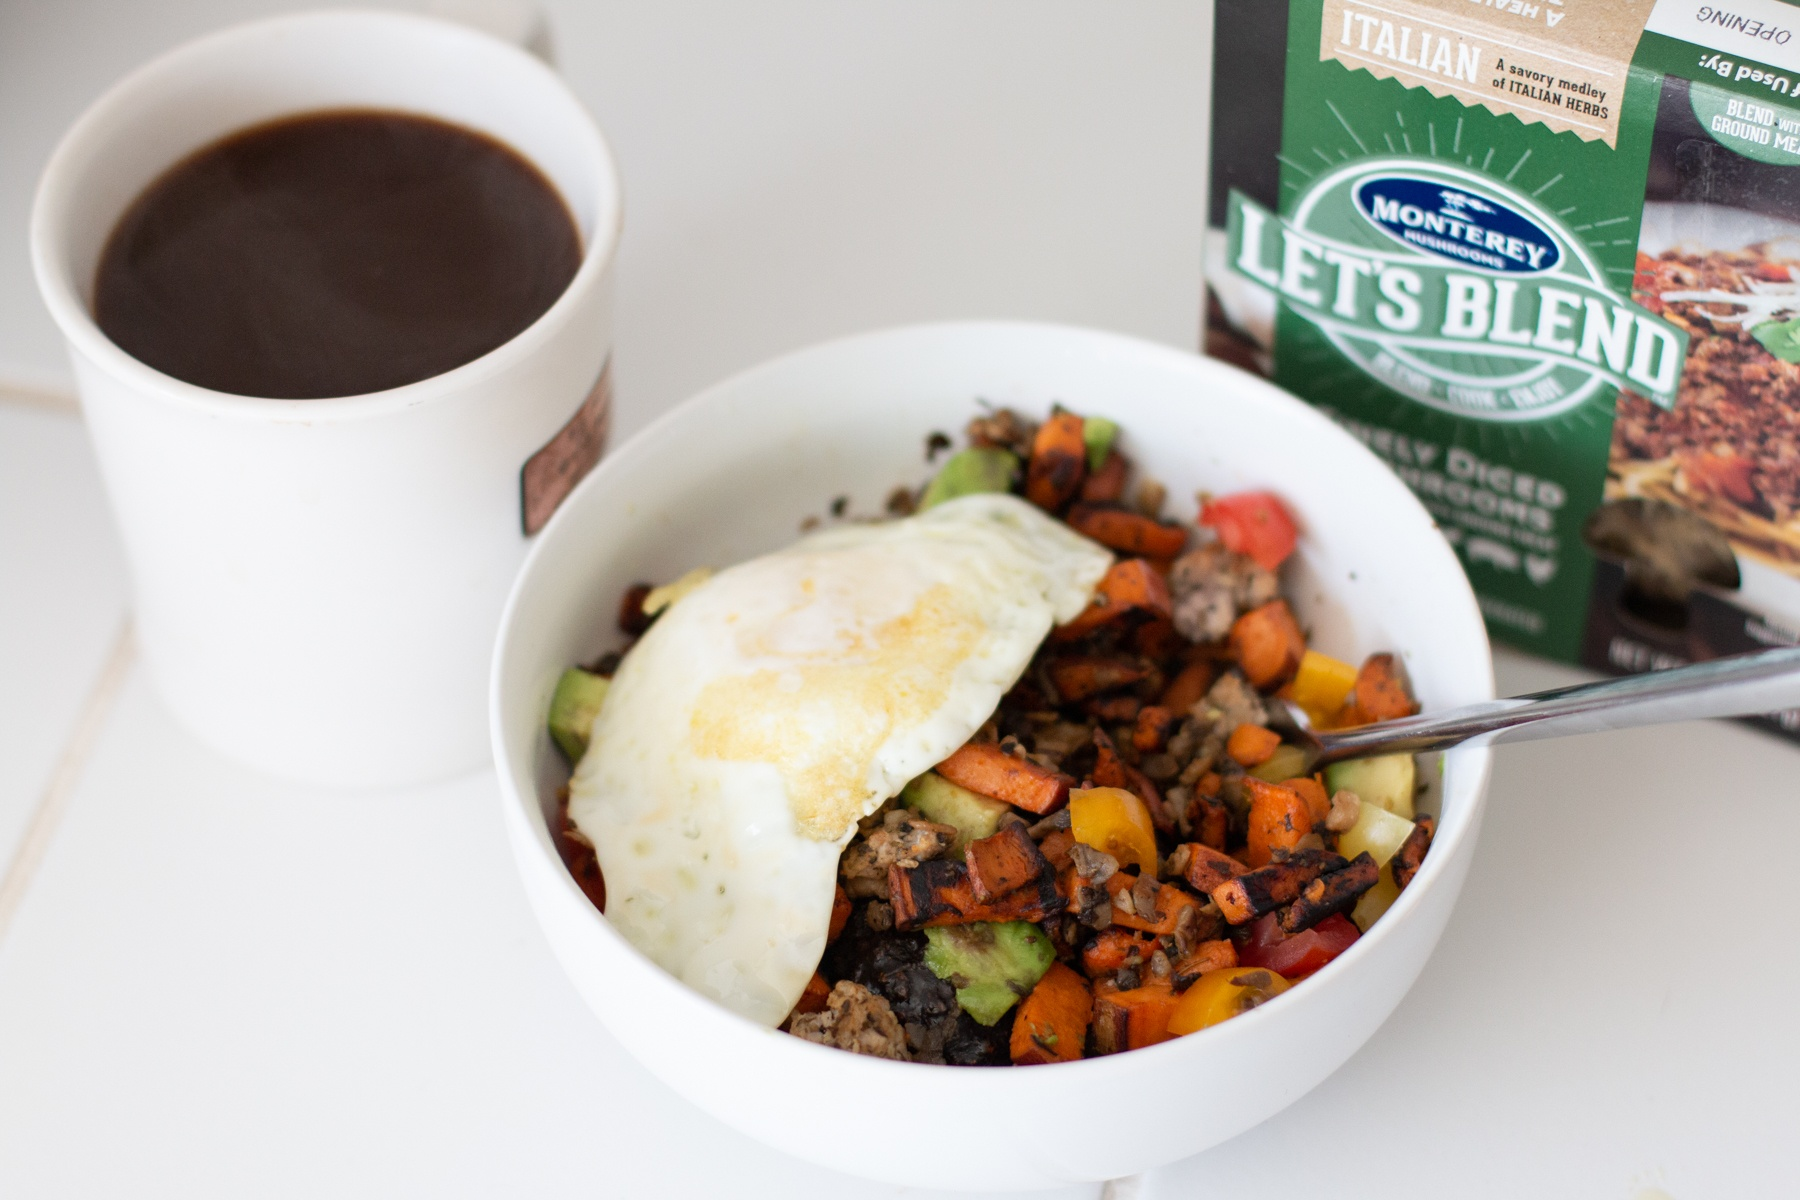 lets-blend-breakfast-bowl-11